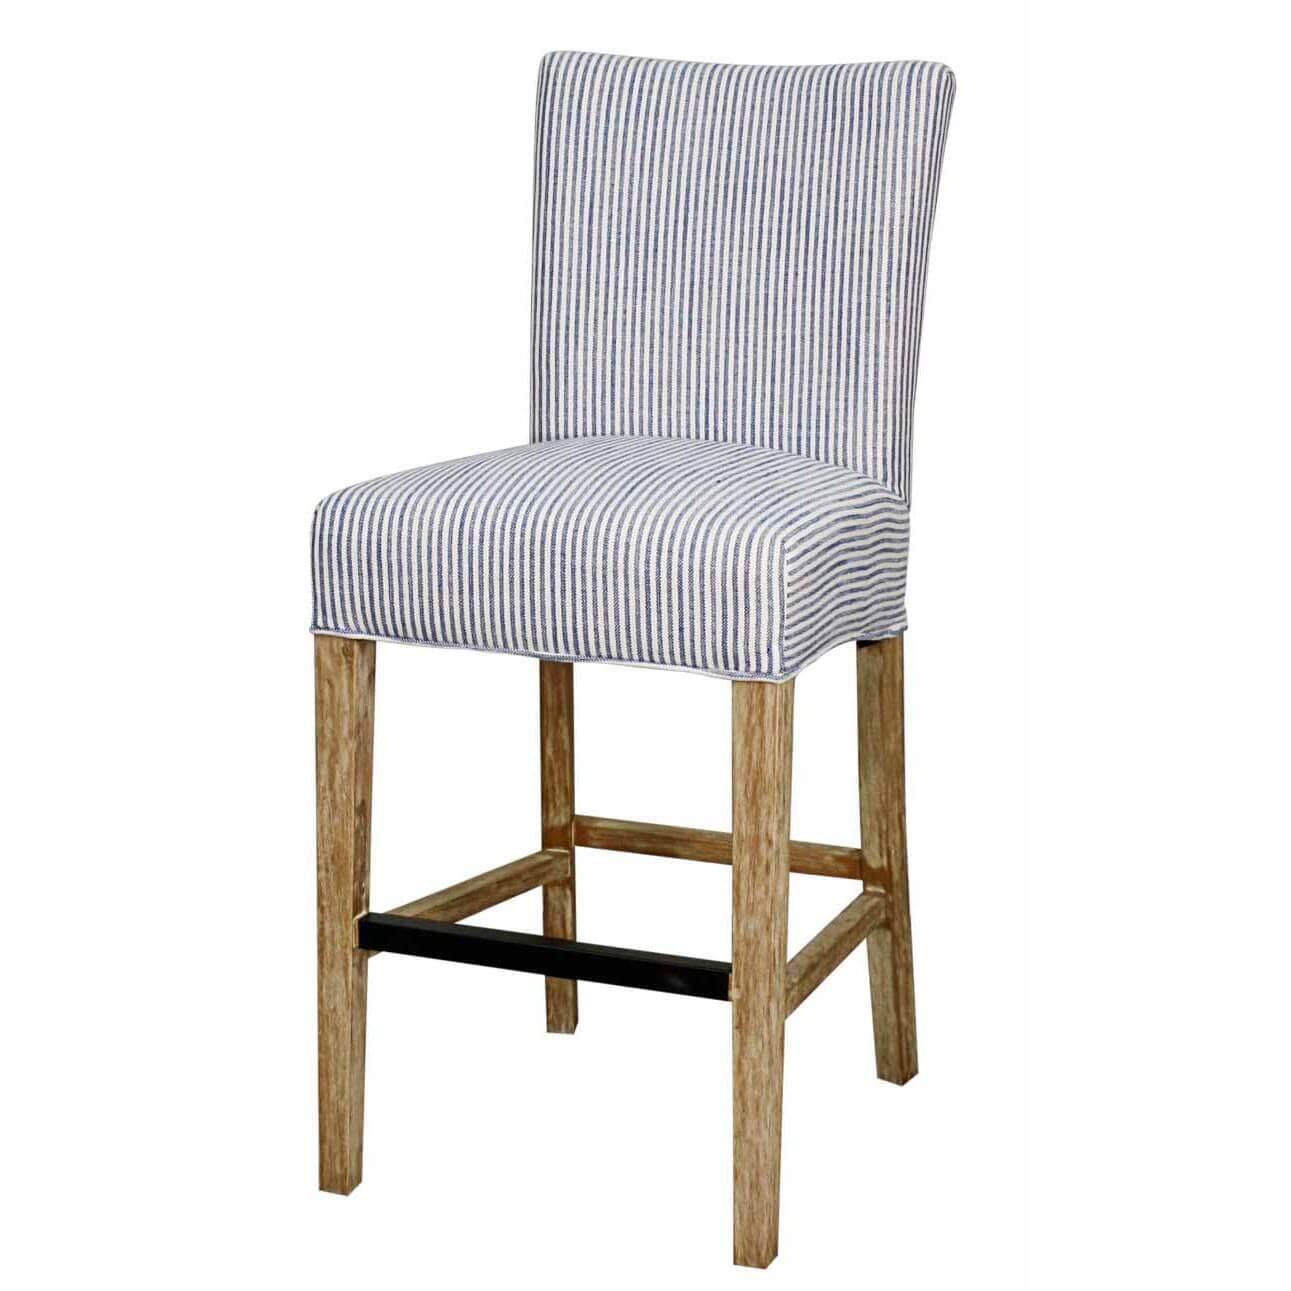 Fabric Kitchen Stools: Milton Fabric Bar Stool, Natural Wood Legs, Blue Stripes